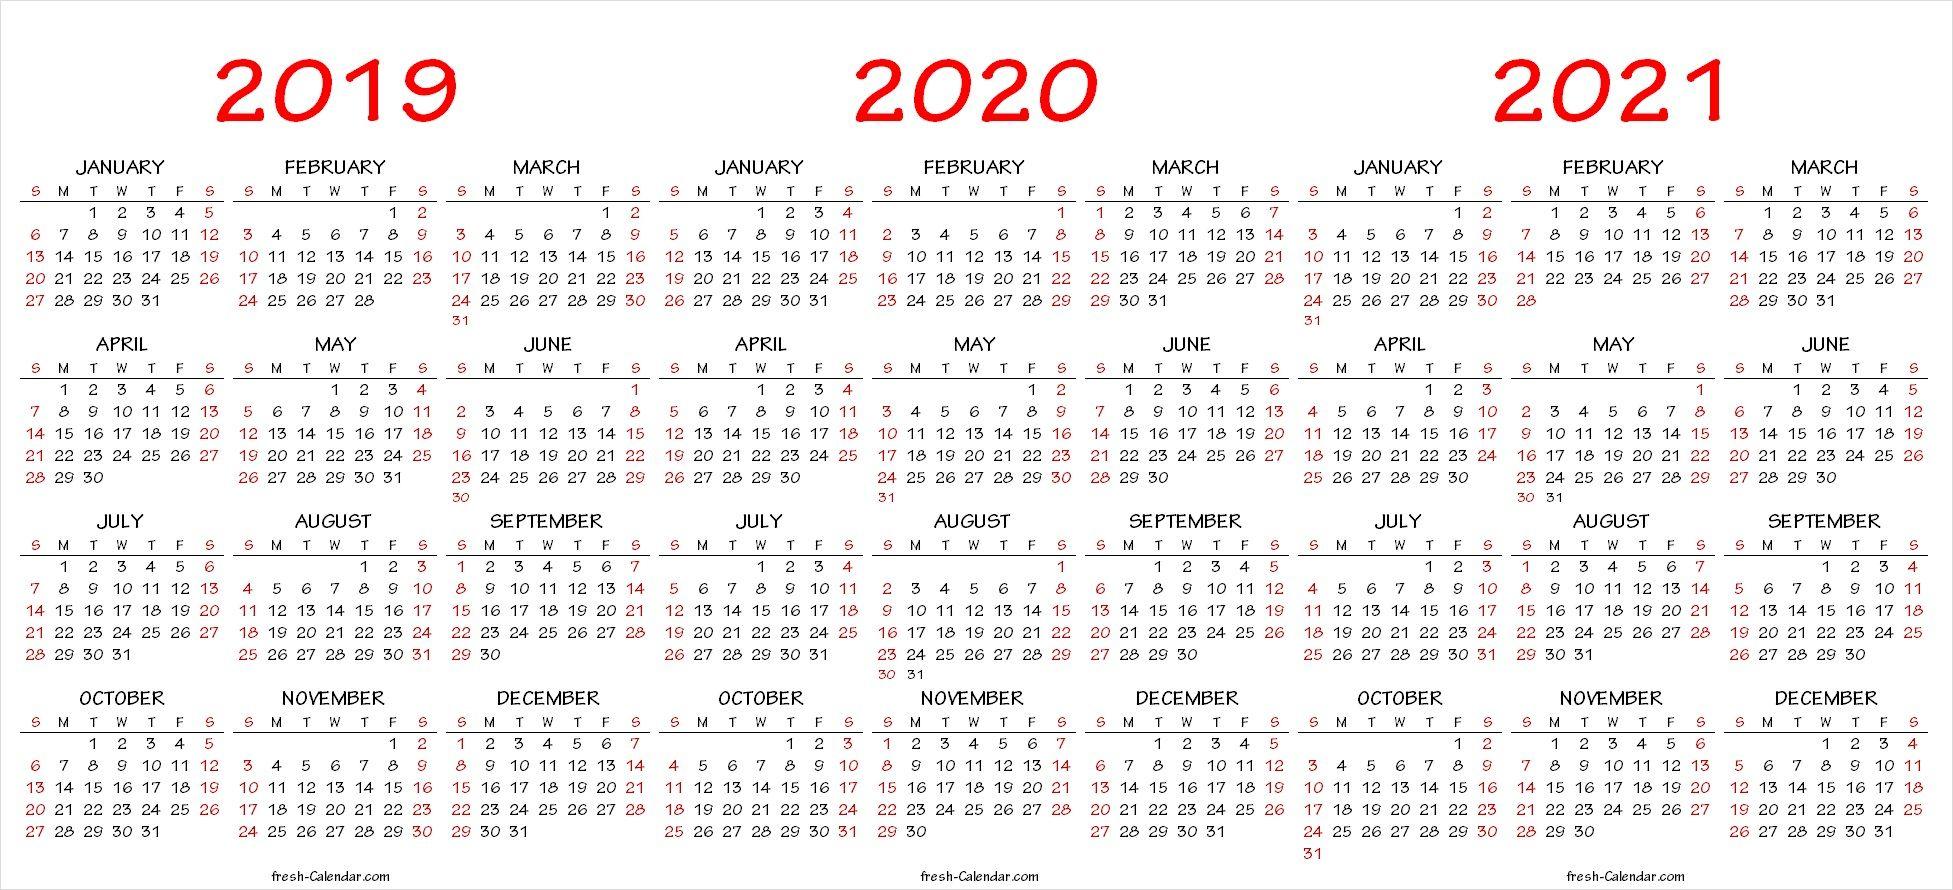 2019 2020 2021 Calendar Pdf Template | Calendar Printables in 2021 - 2023 Four Year Monthly Calendar